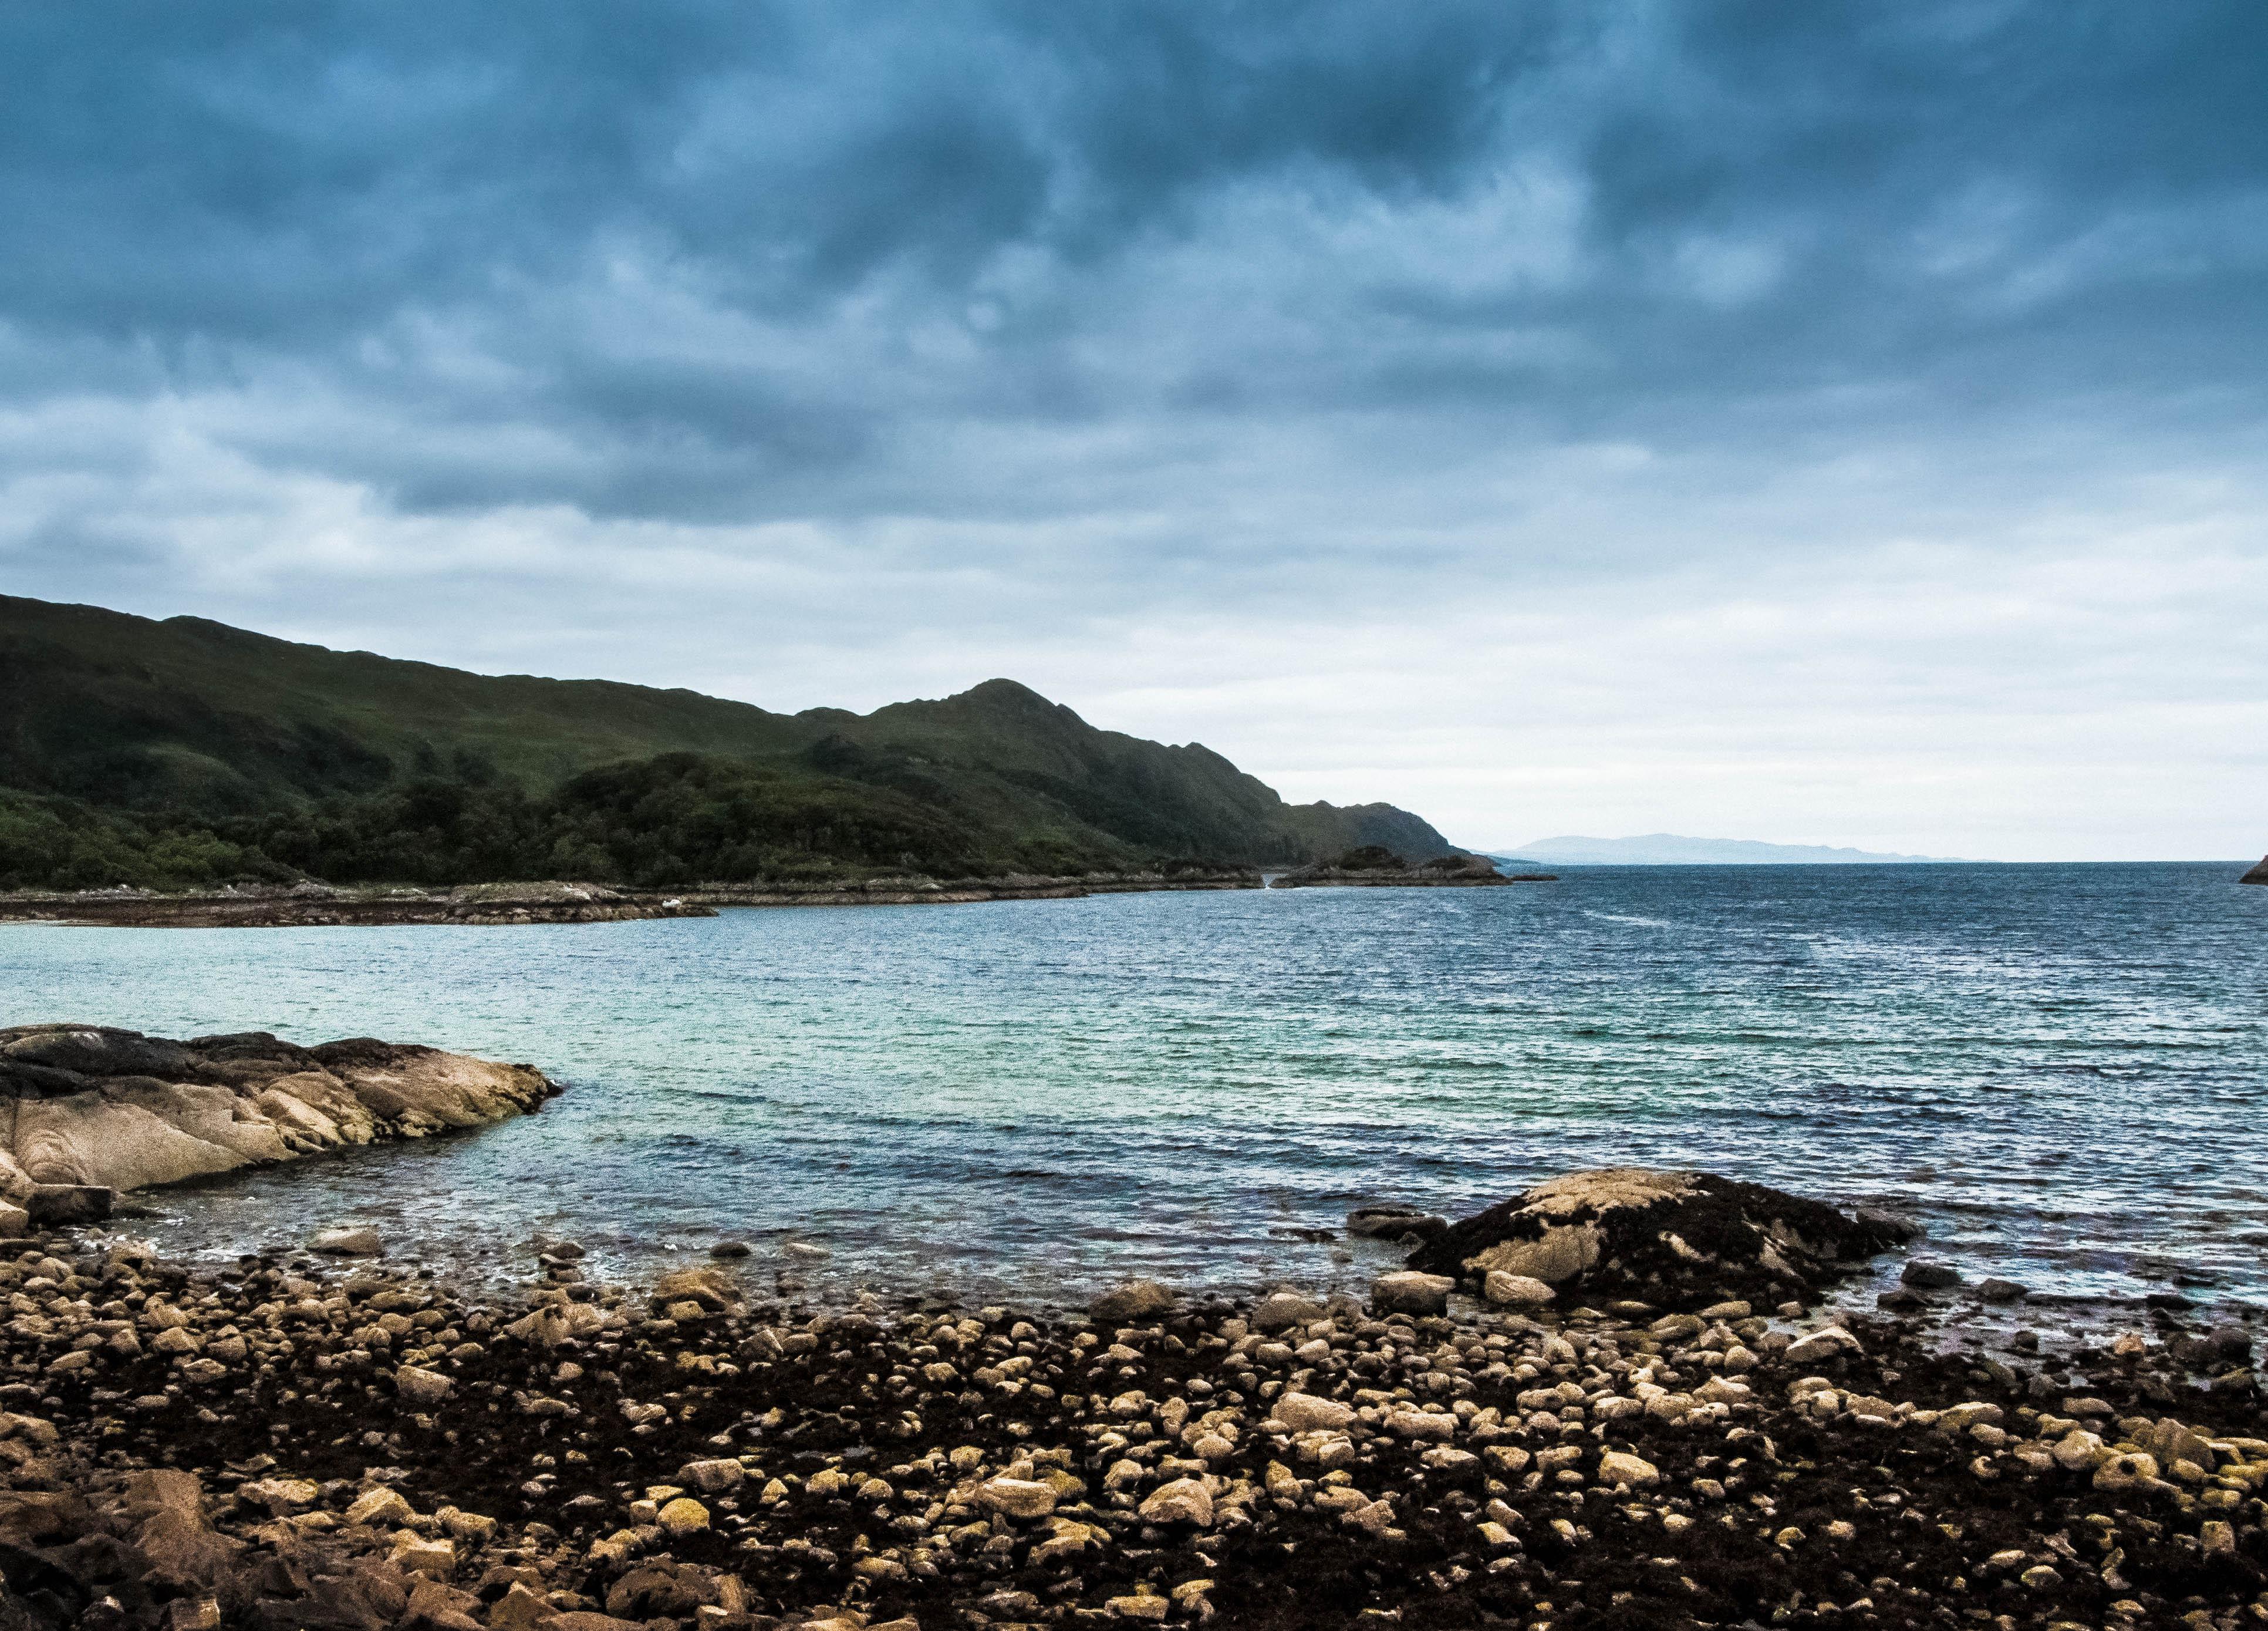 Flickr - Morar, the deep Highlands essence